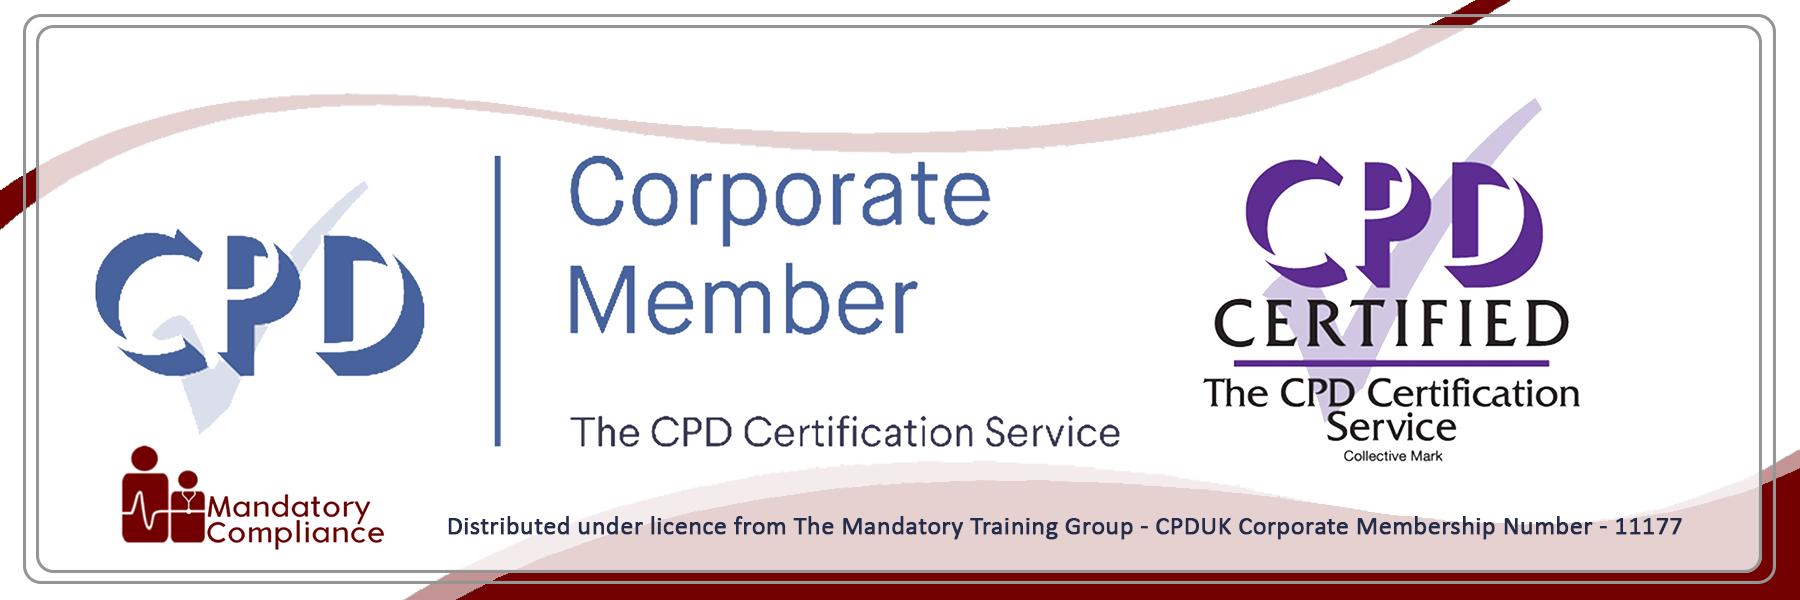 Multi-Level Marketing Training - Online Training Course - CPD Accredited - Mandatory Compliance UK -